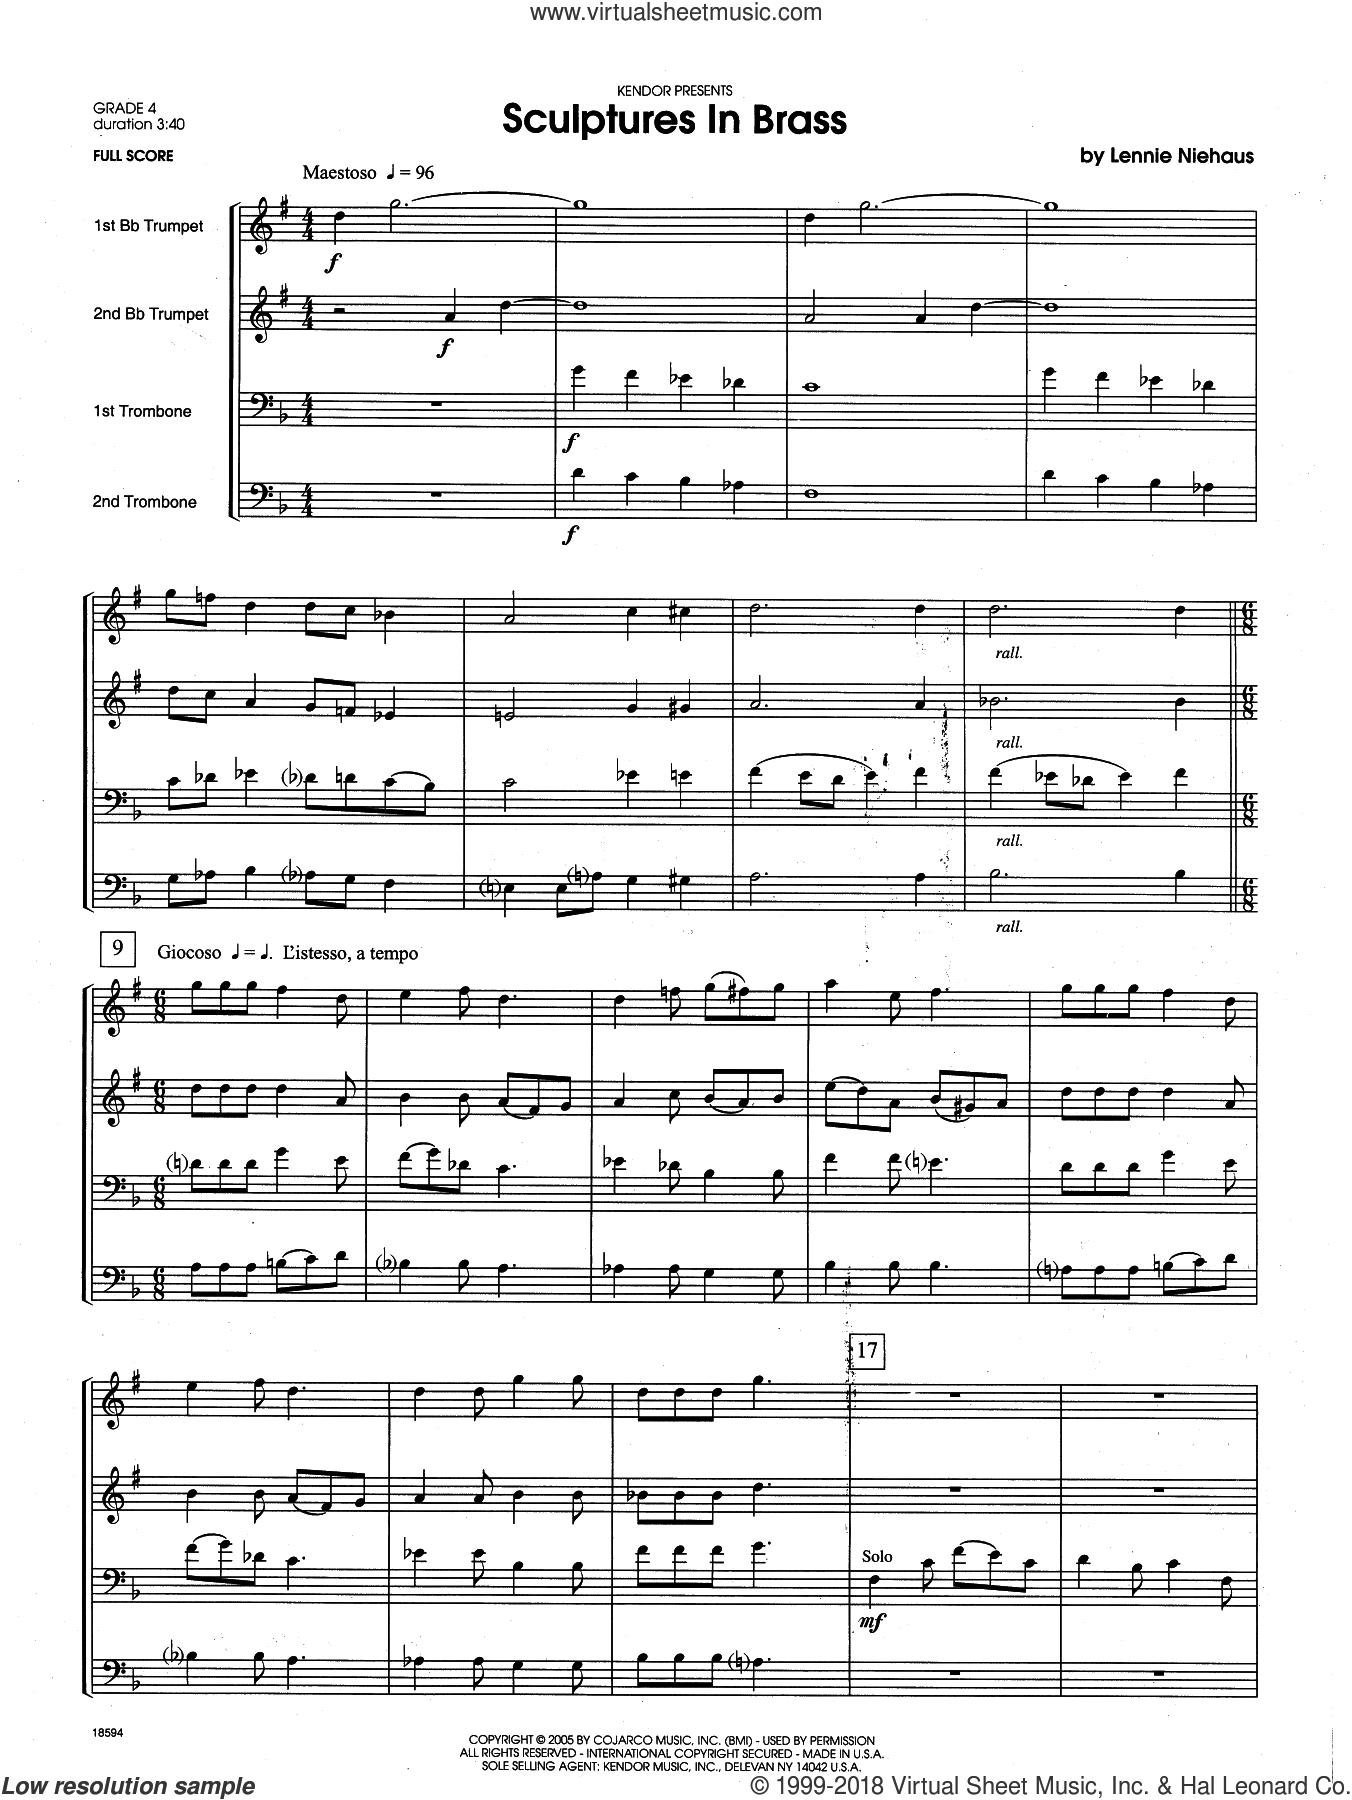 Sculptures In Brass (COMPLETE) sheet music for brass quartet by Lennie Niehaus, intermediate skill level